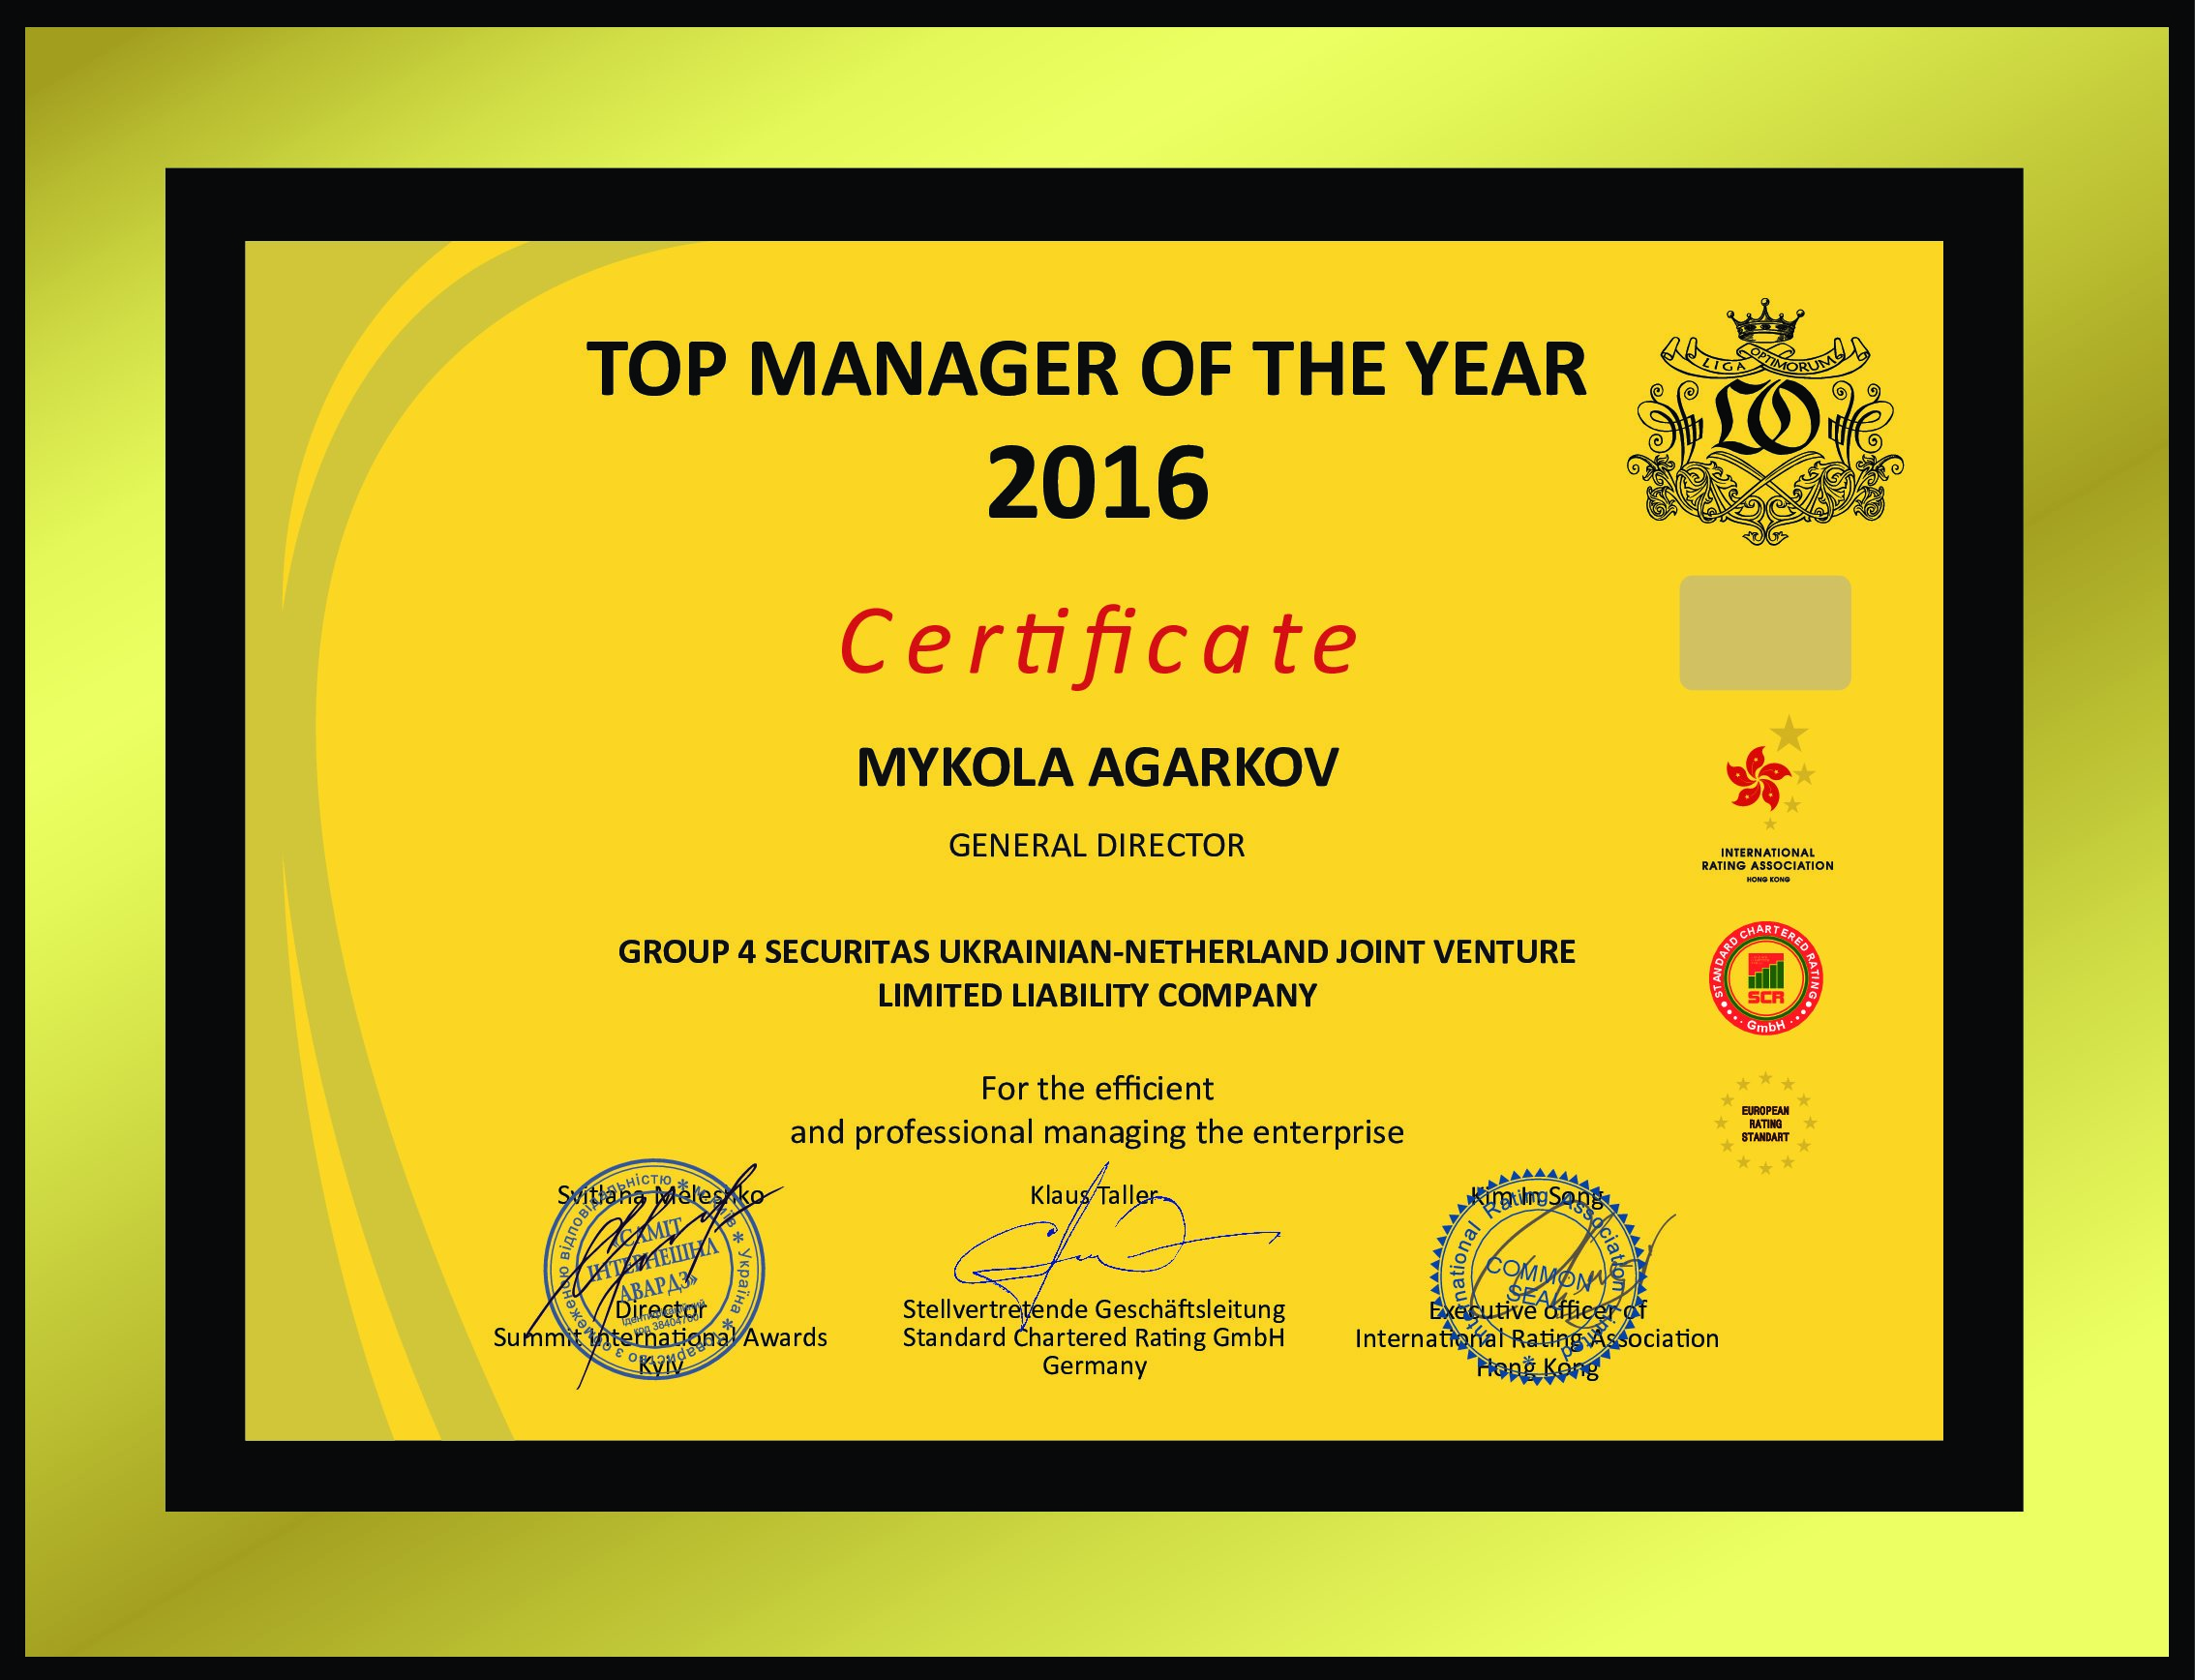 Особиста статус-нагорода «Керівник року — 2016 в Україні»